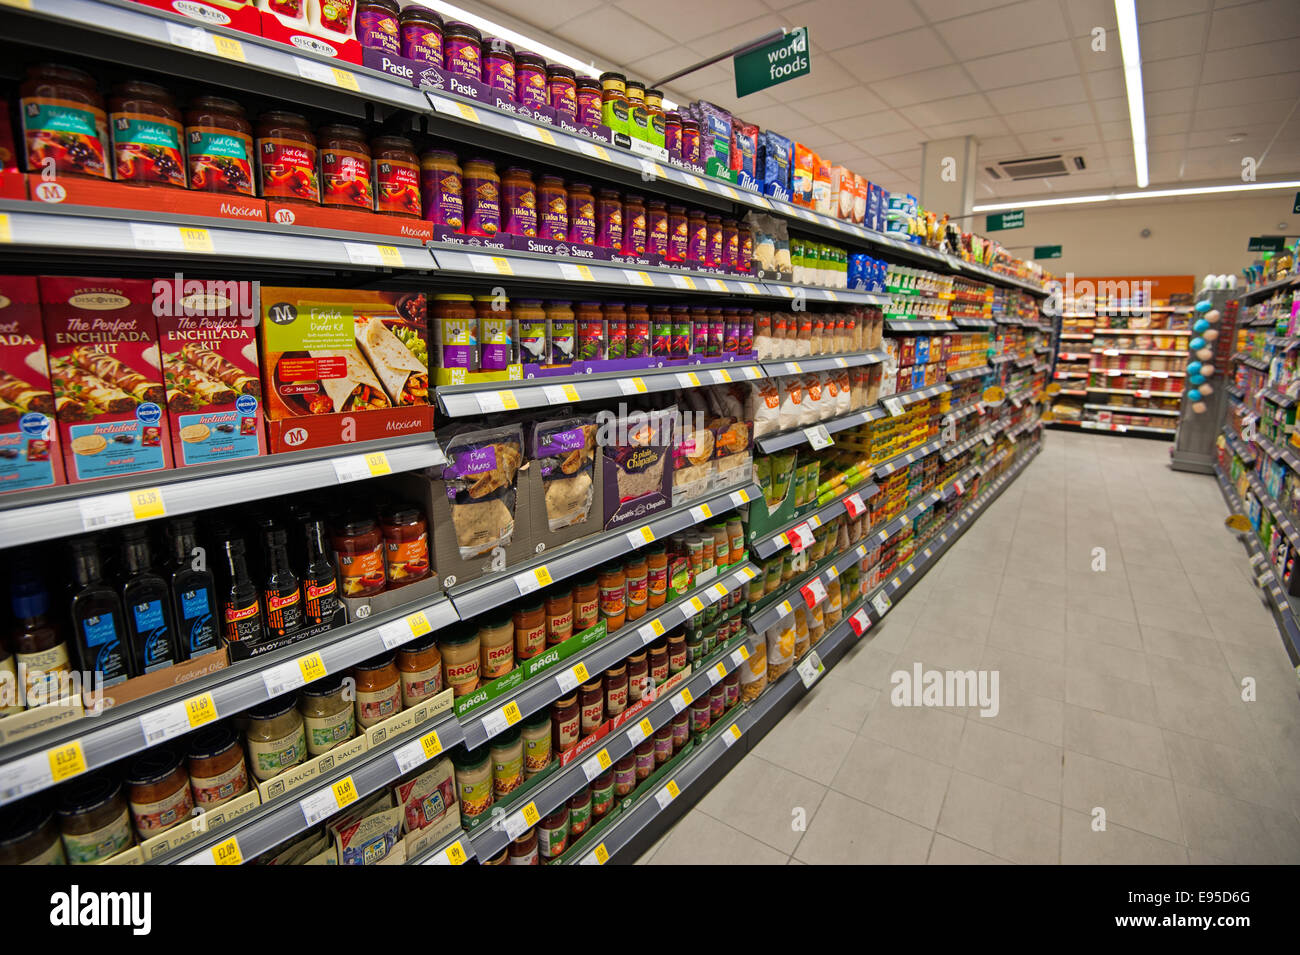 Supermarket world foods aisle with shelves packed full - Stock Image